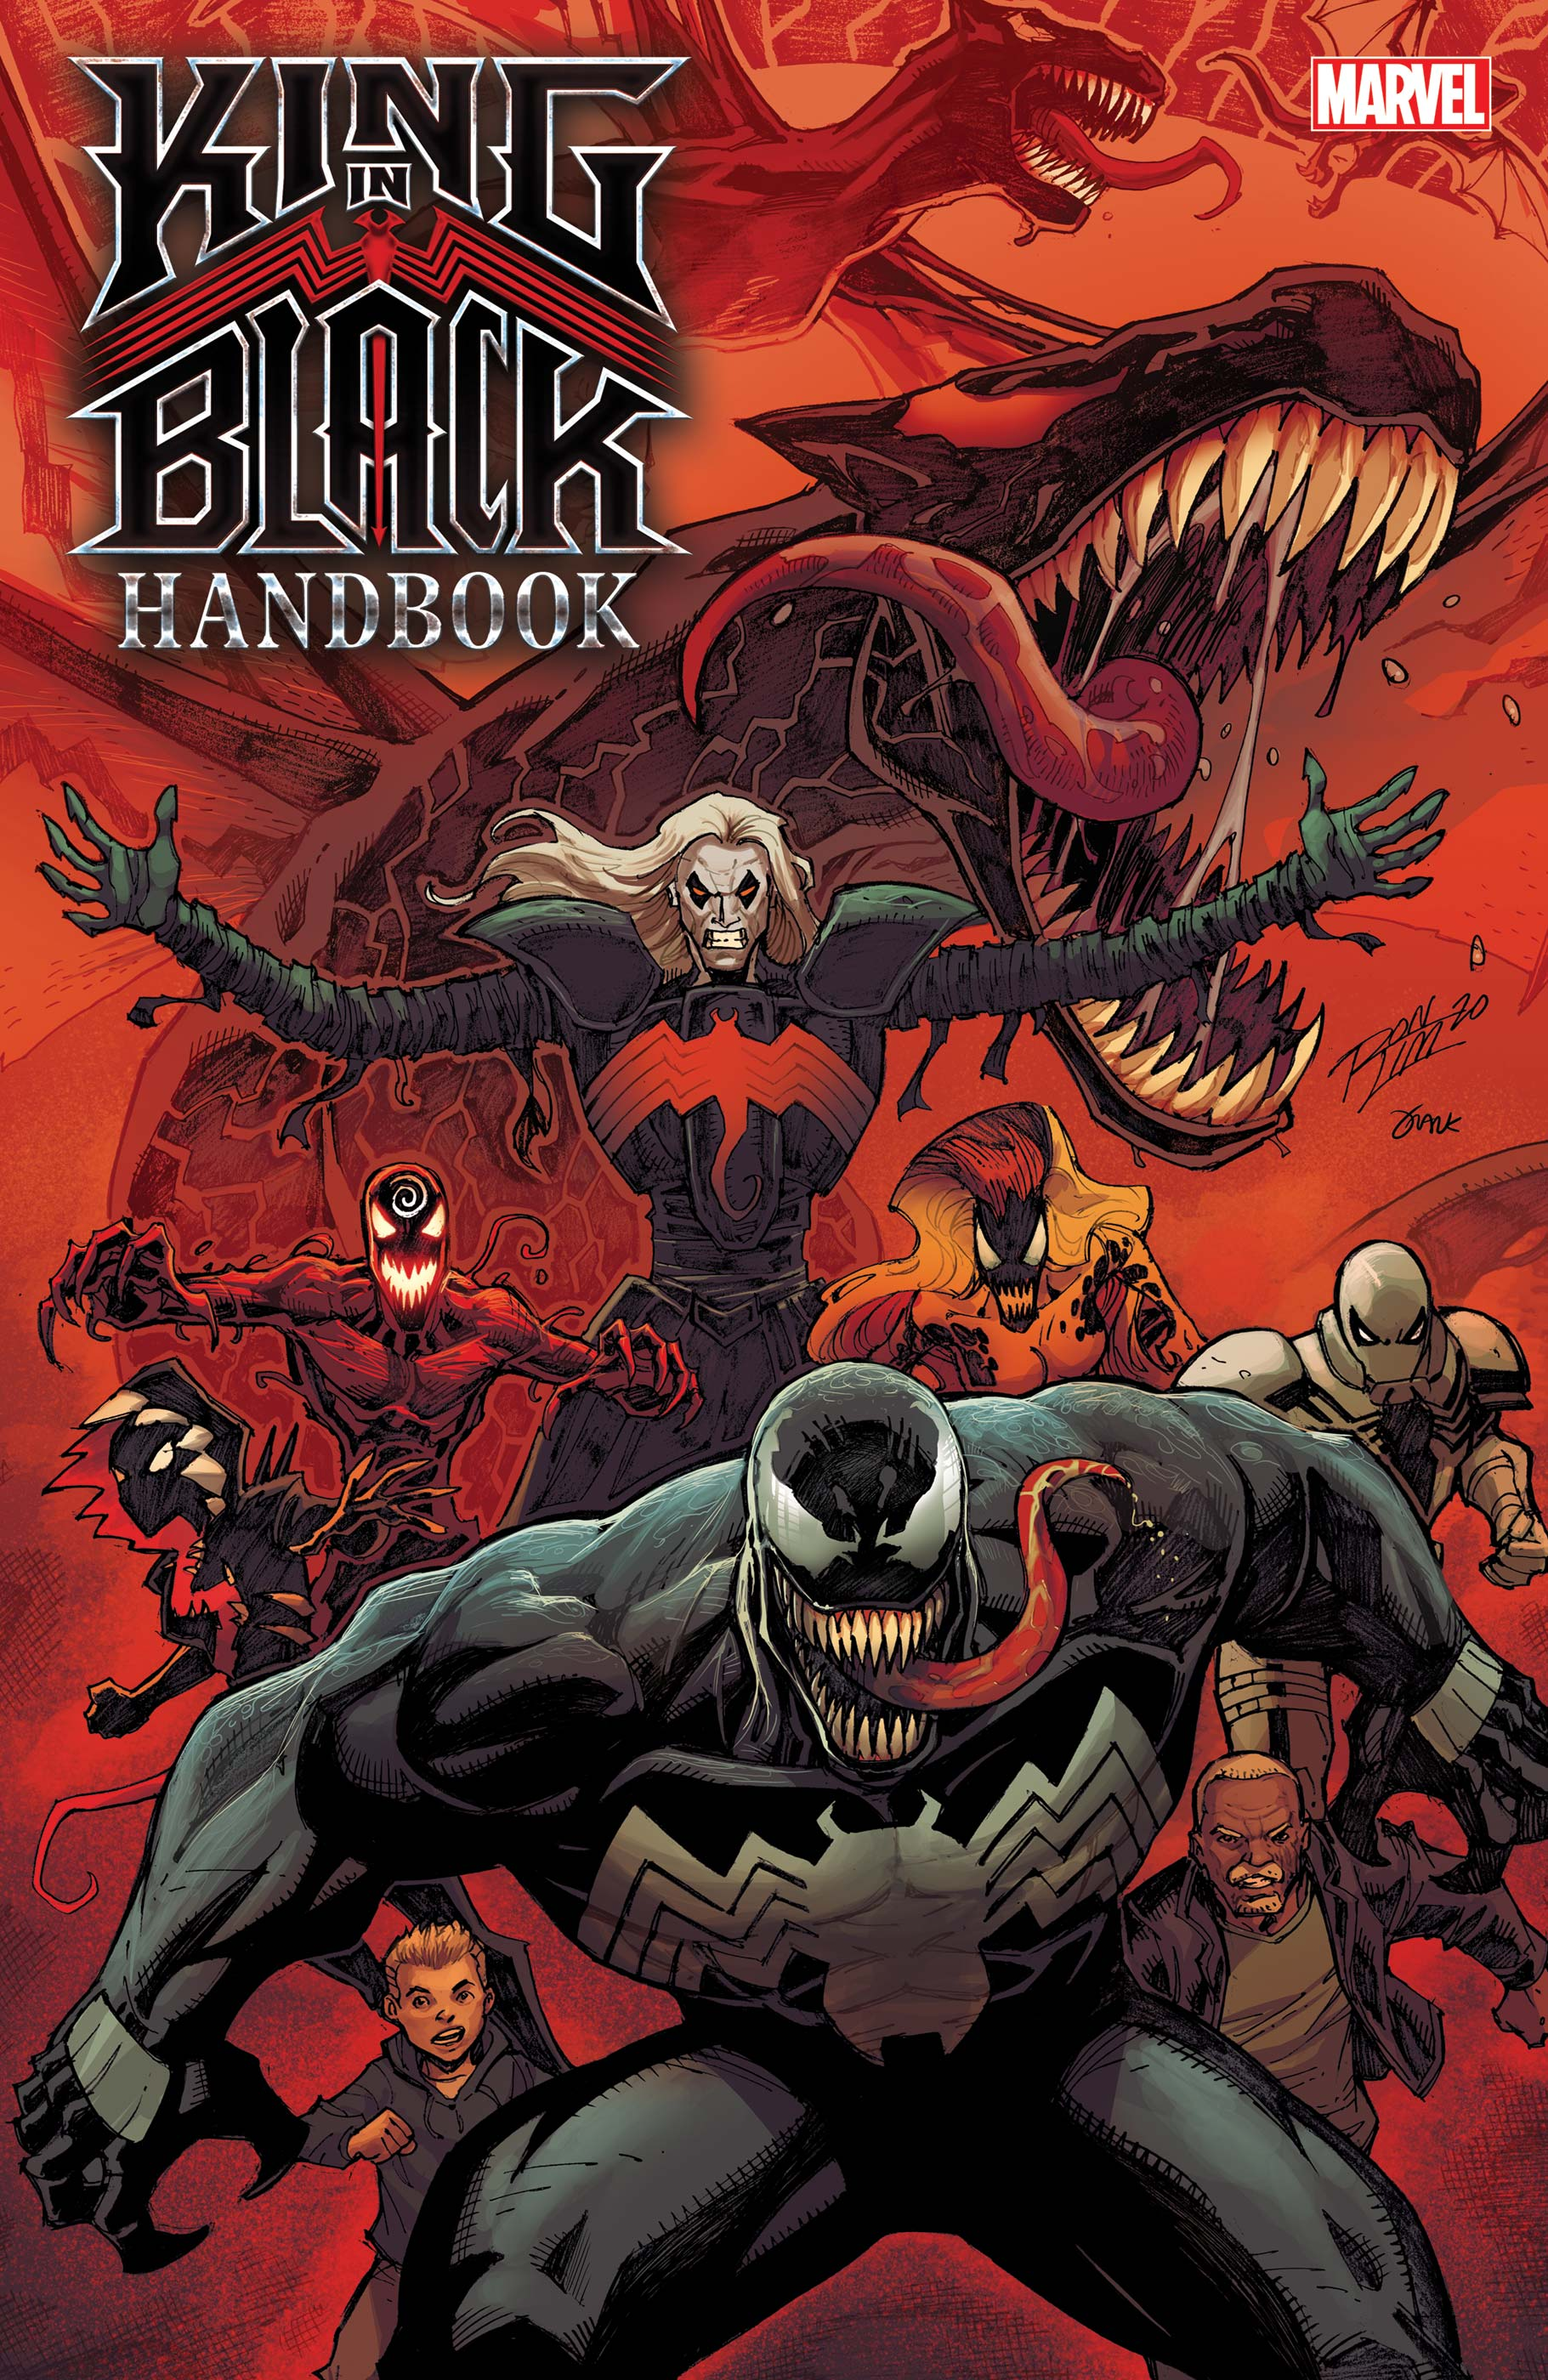 King In Black Handbook (2021) #1